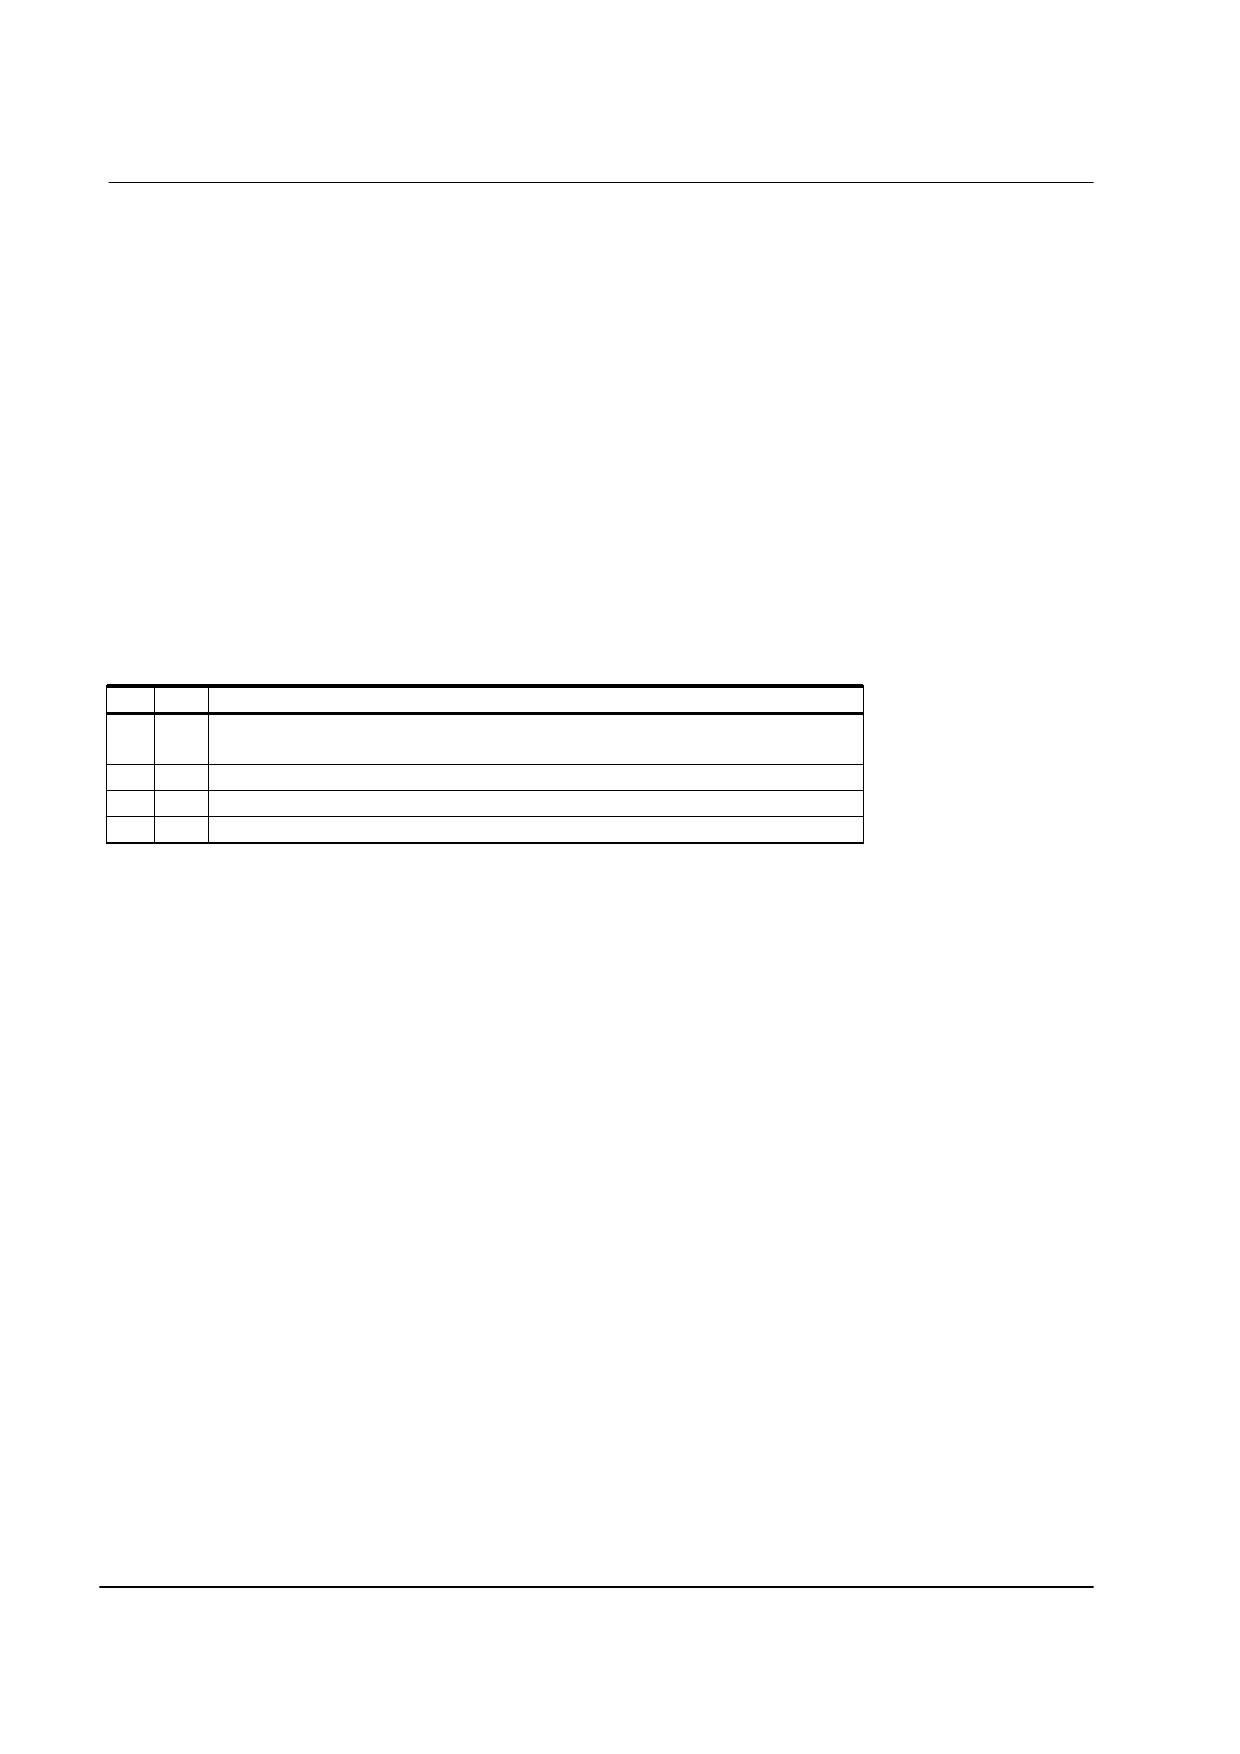 ST7066 Datasheet, Funktion